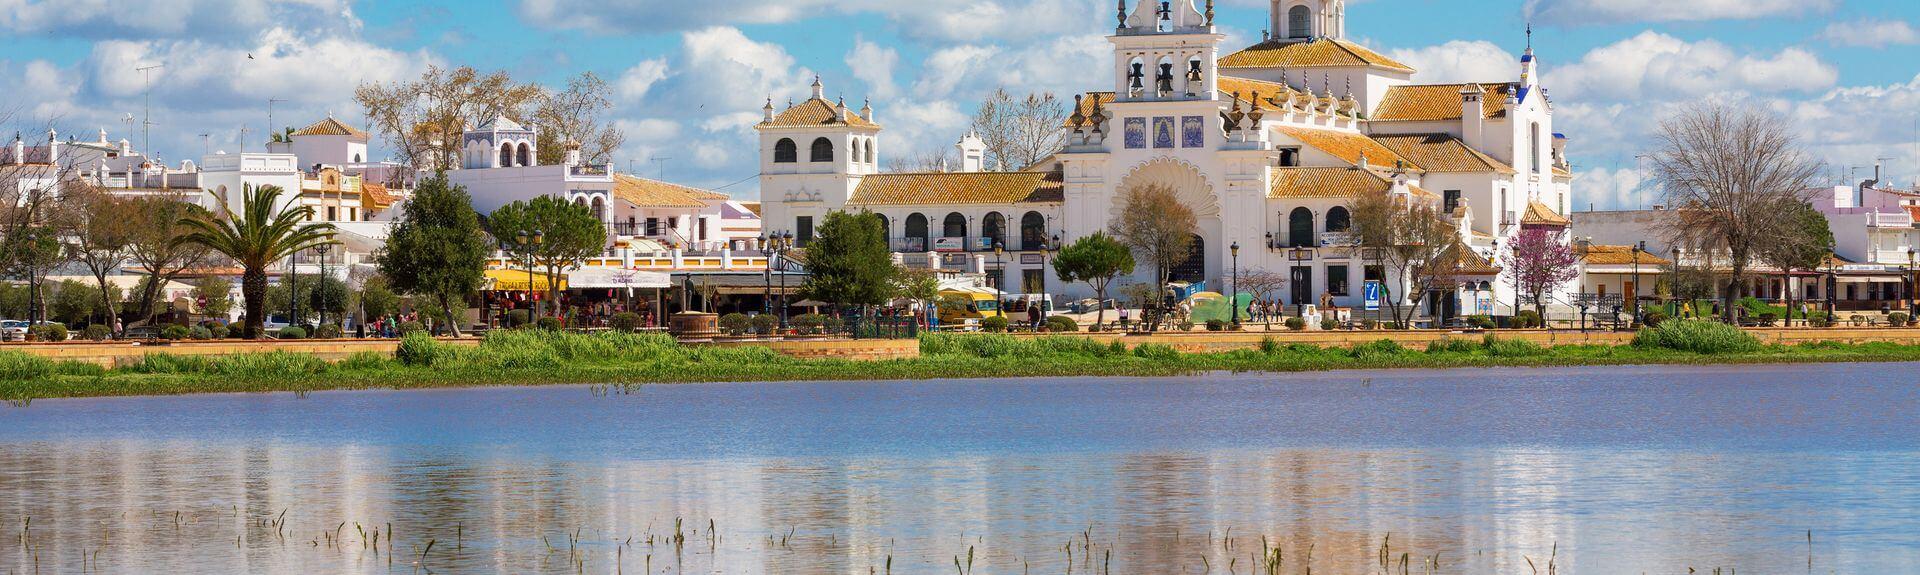 ORganización de eventos en Huelva